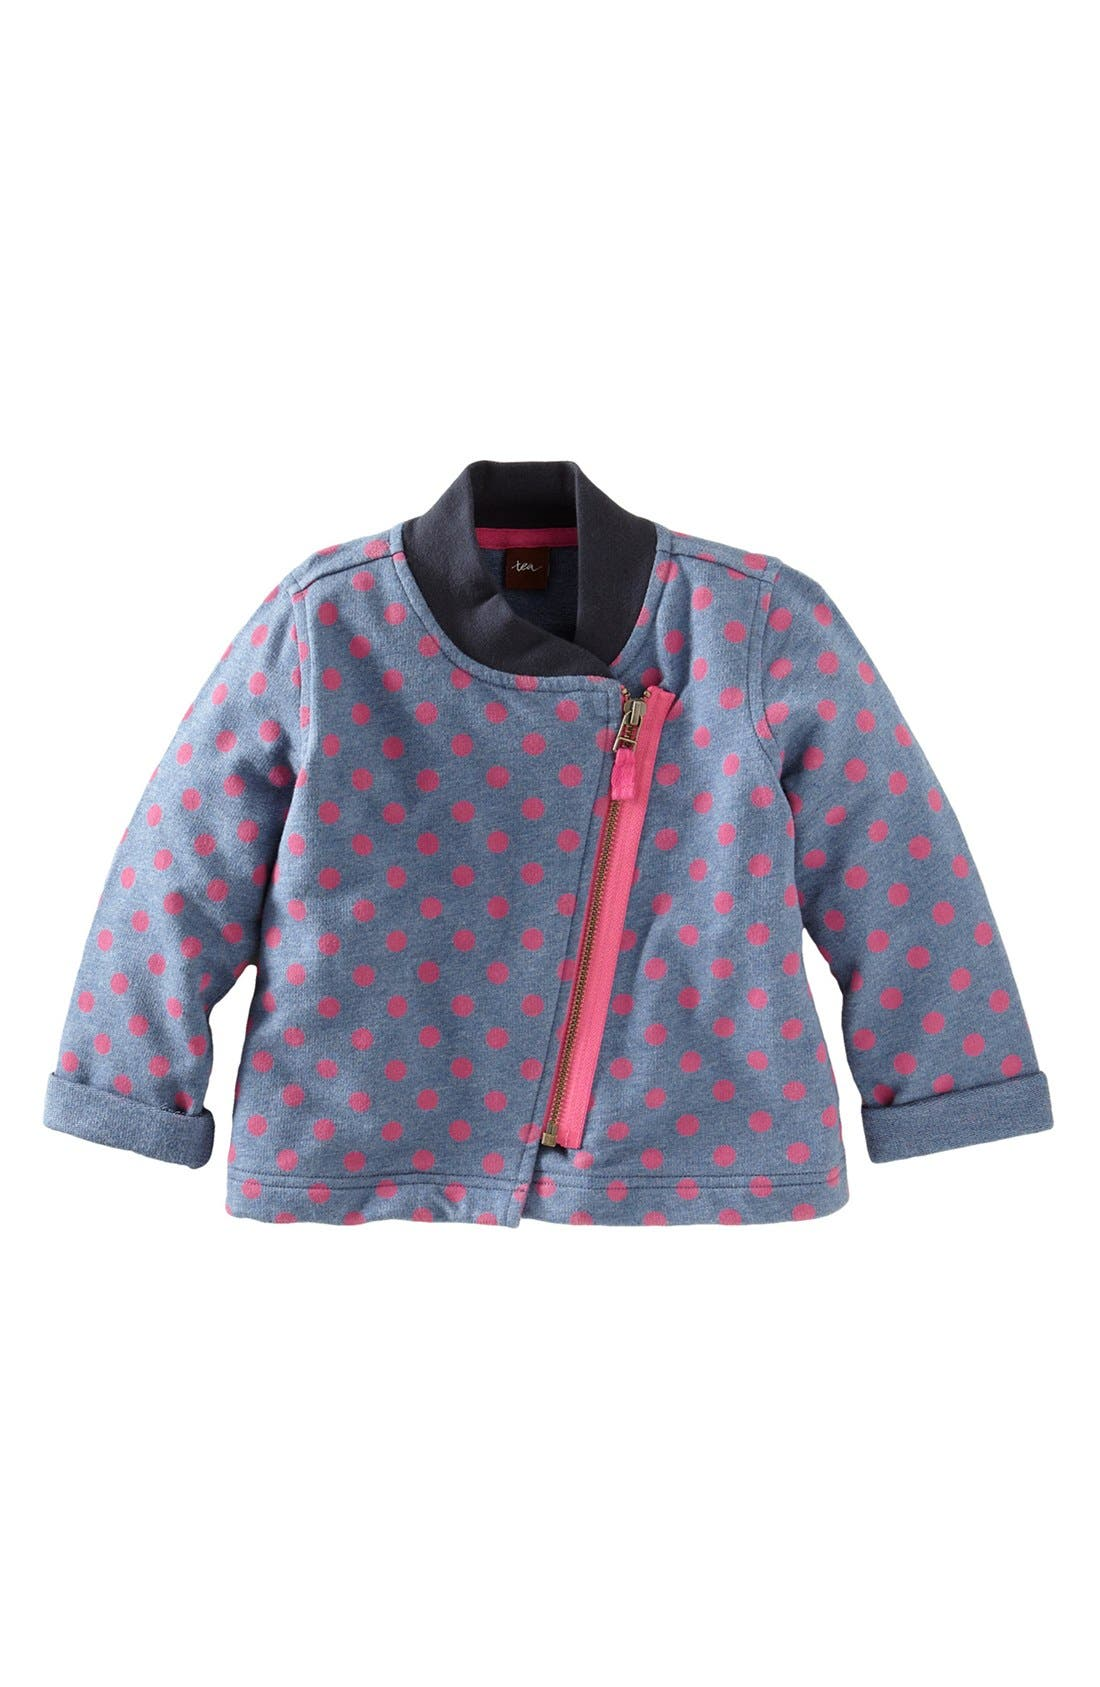 Main Image - Tea Collection Polka Dot Moto Jacket (Little Girls & Big Girls)